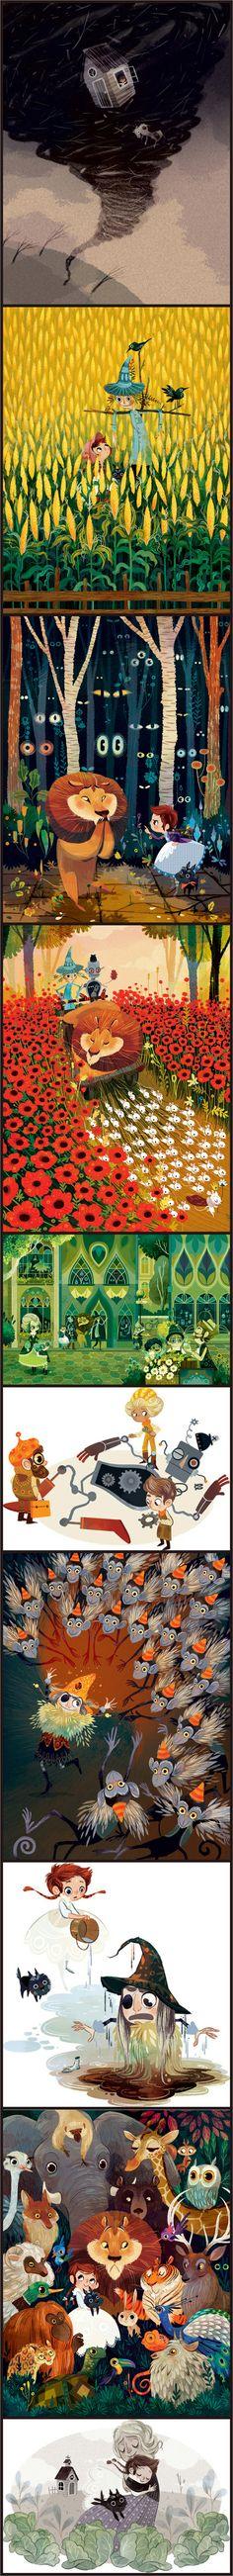 The Wonderful Wizard of Oz, illustrated by Lorena Alvarez, 2014